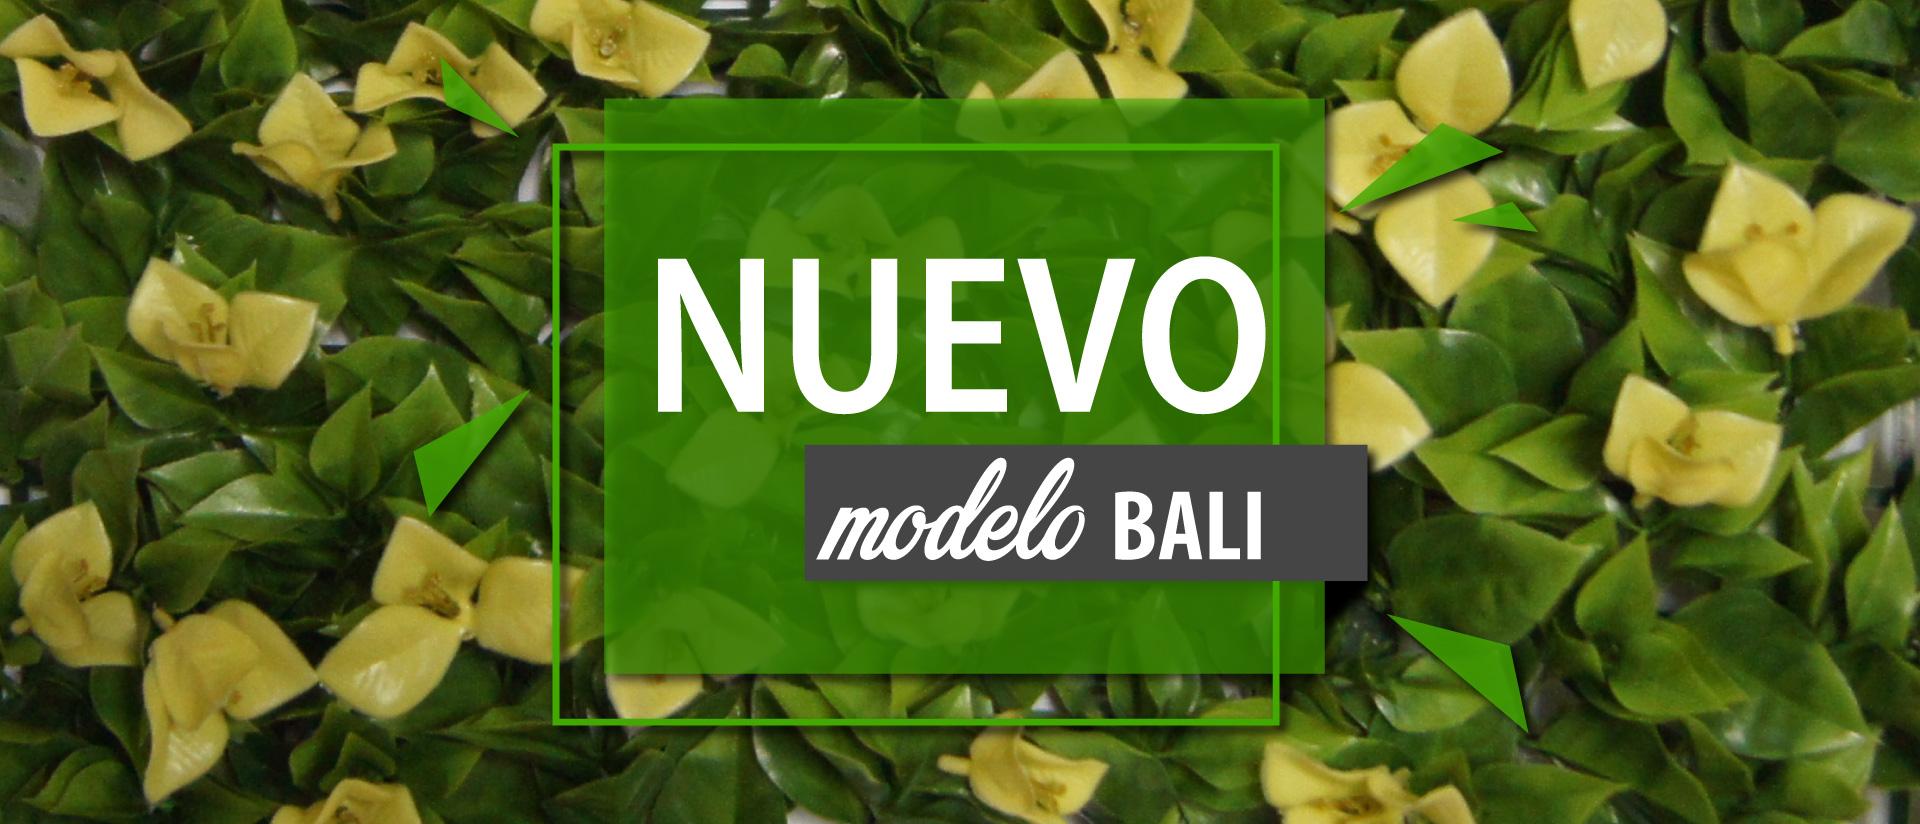 NUEVO-MODELO BALI